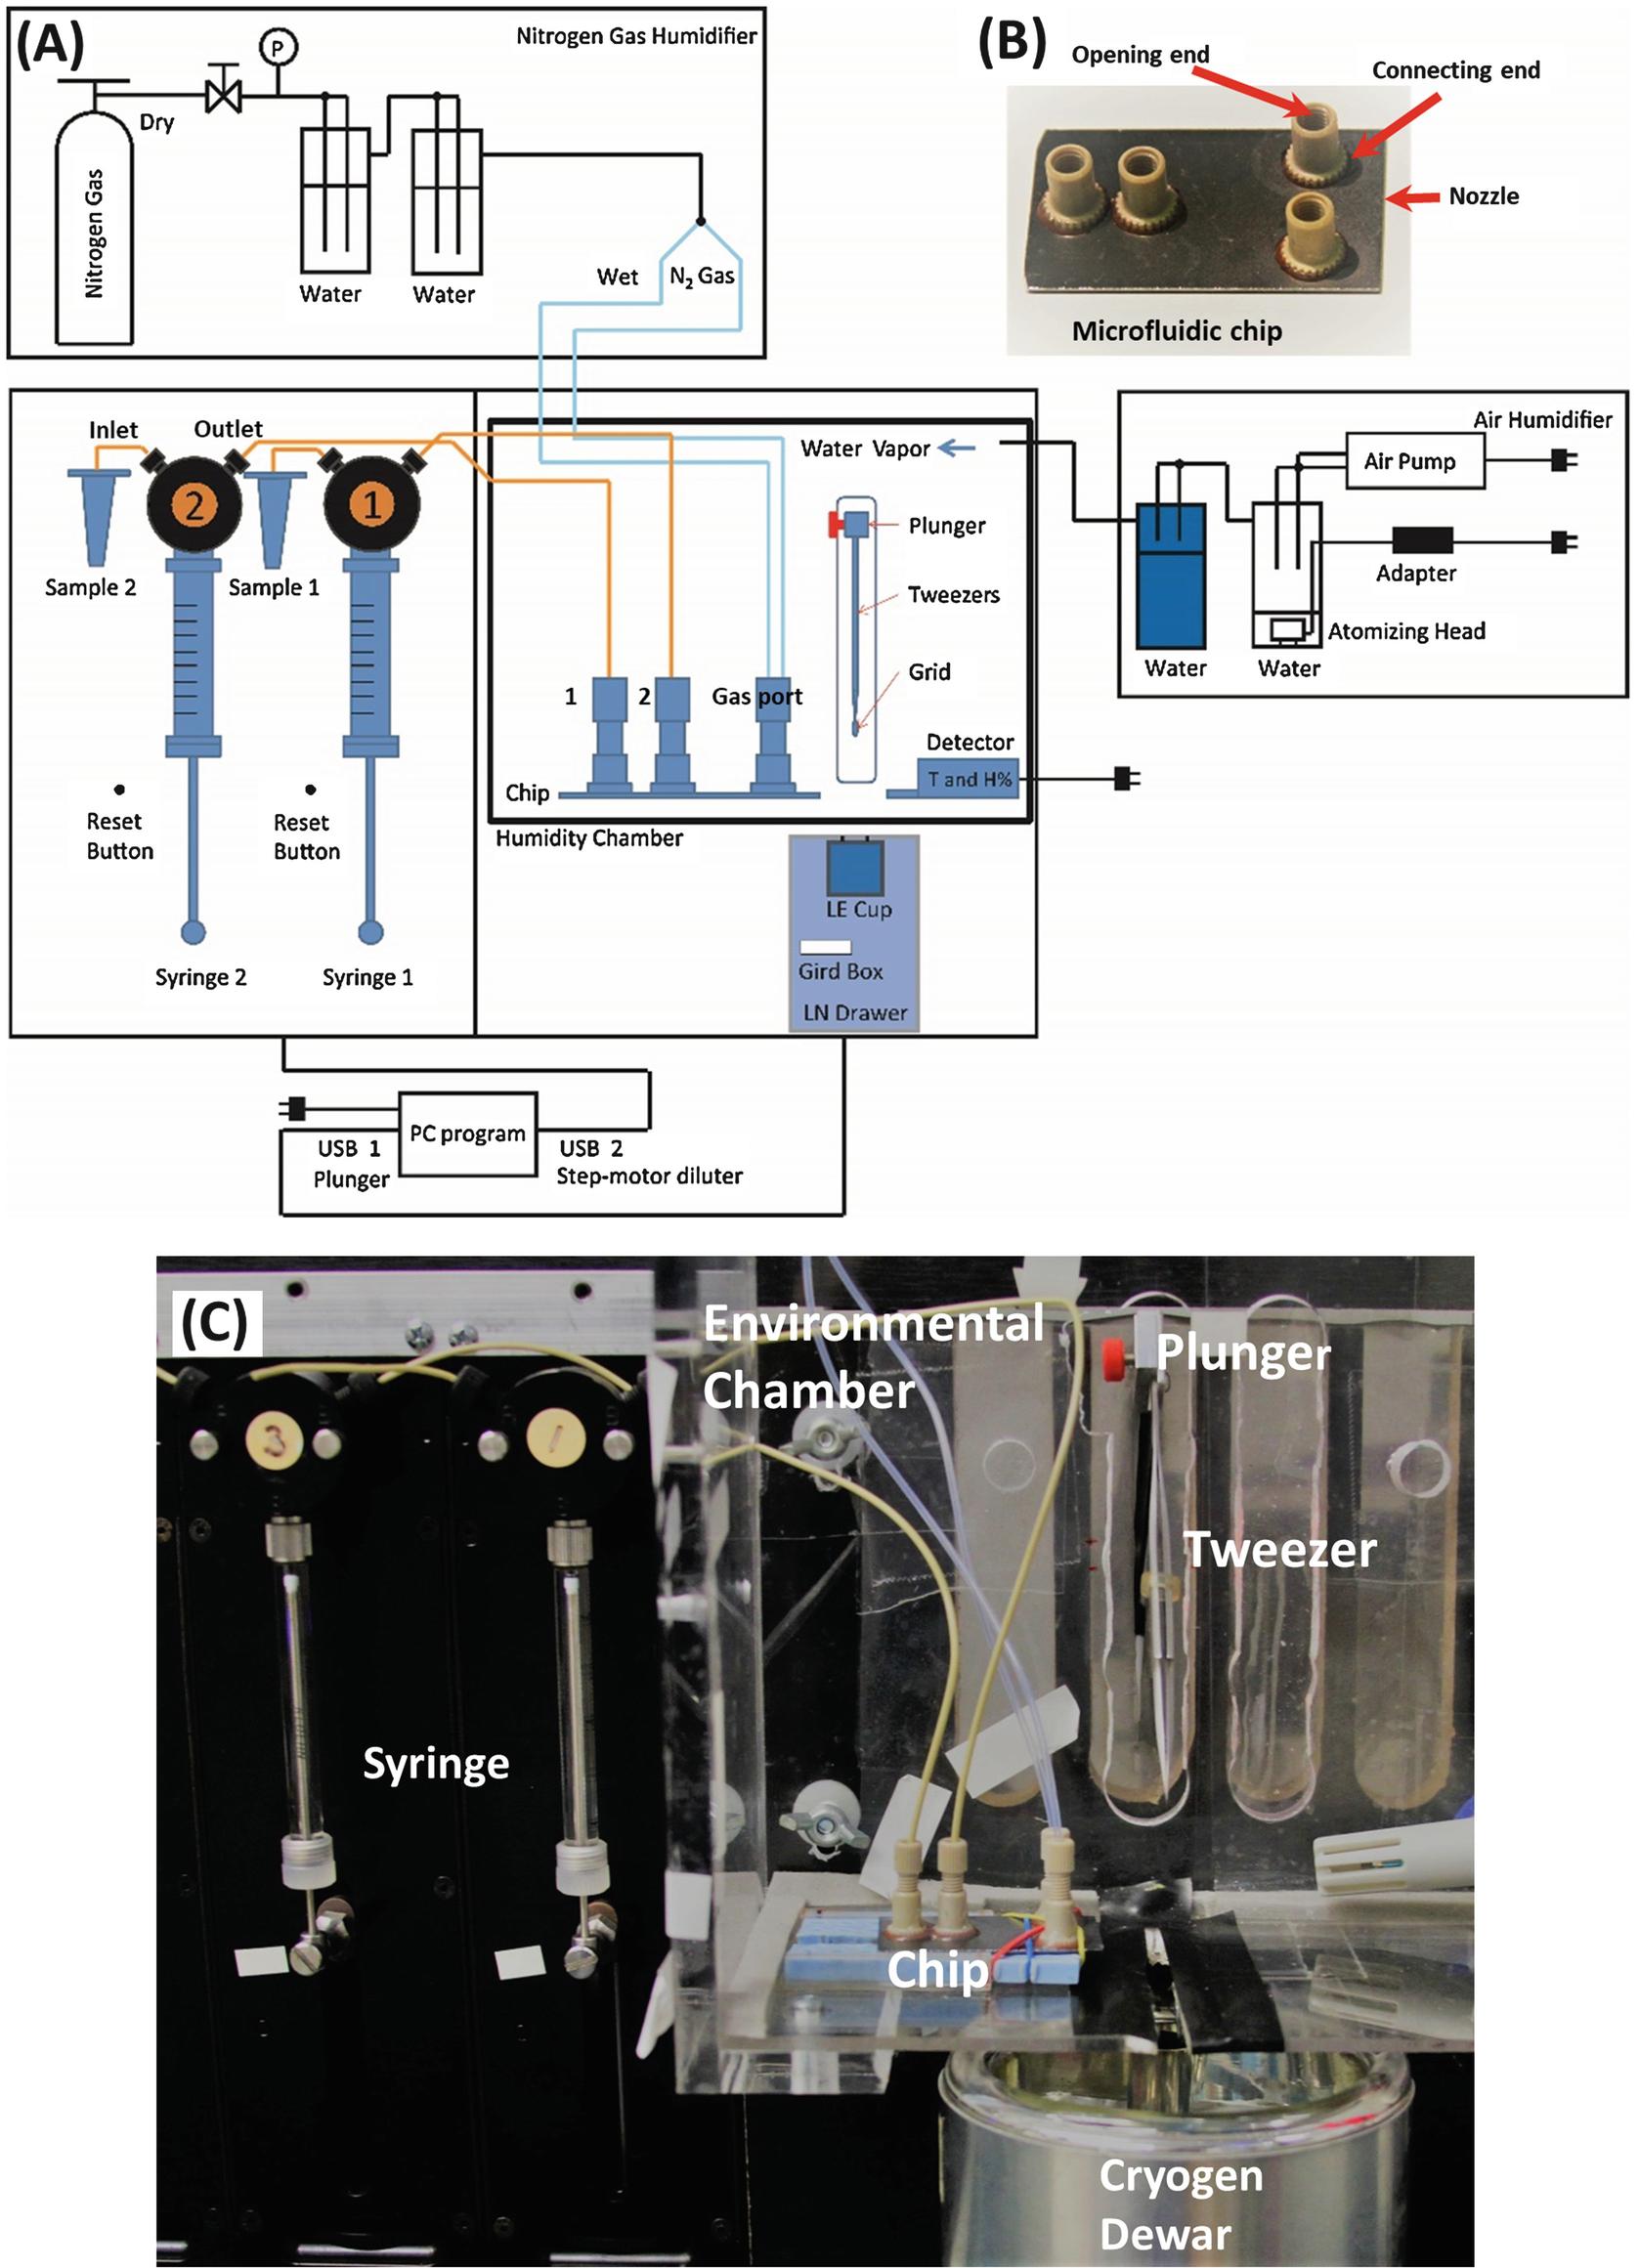 Time-Resolved Cryo-electron Microscopy Using a Microfluidic Chip ...